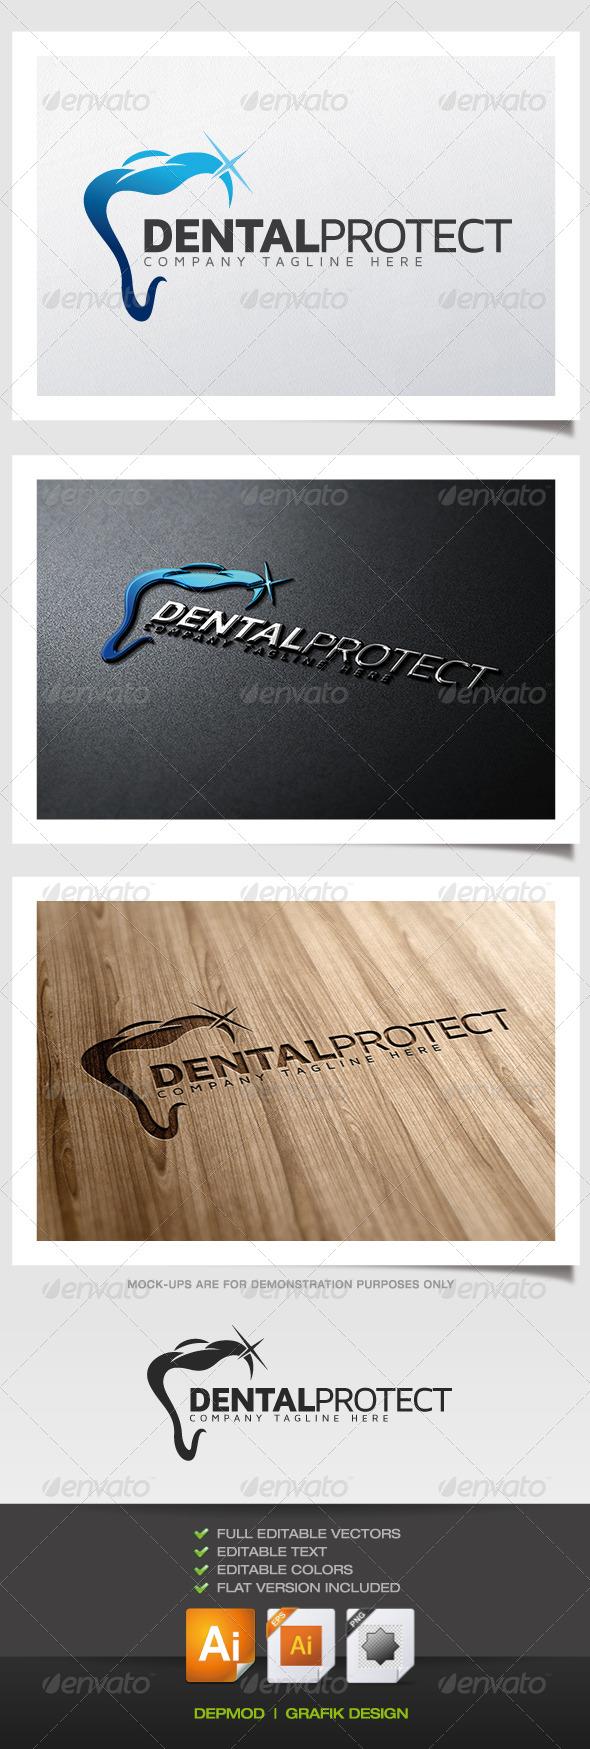 Dental Protect Logo - Objects Logo Templates